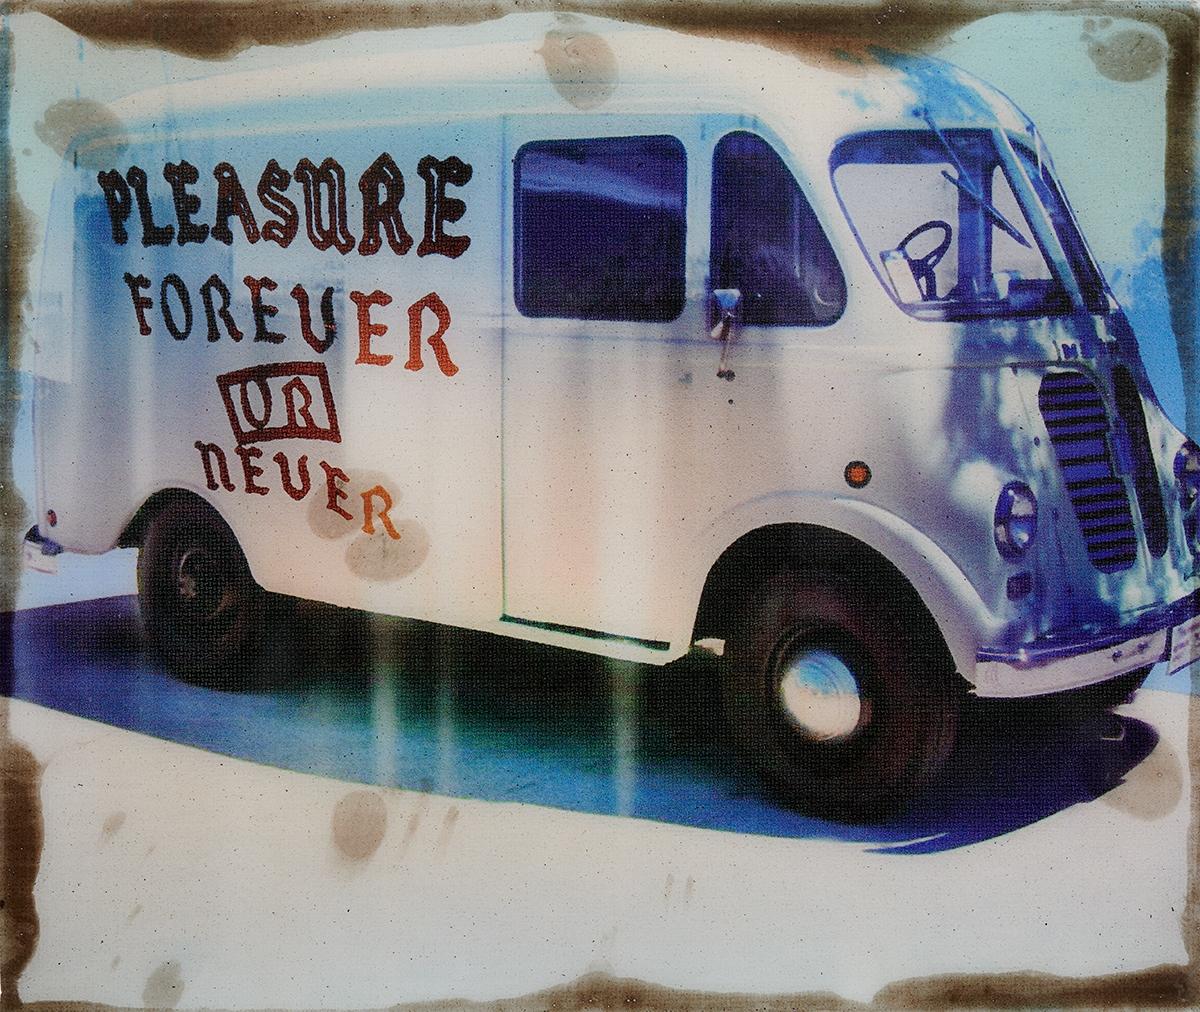 Pleasure Forever - Epoxy - 2019